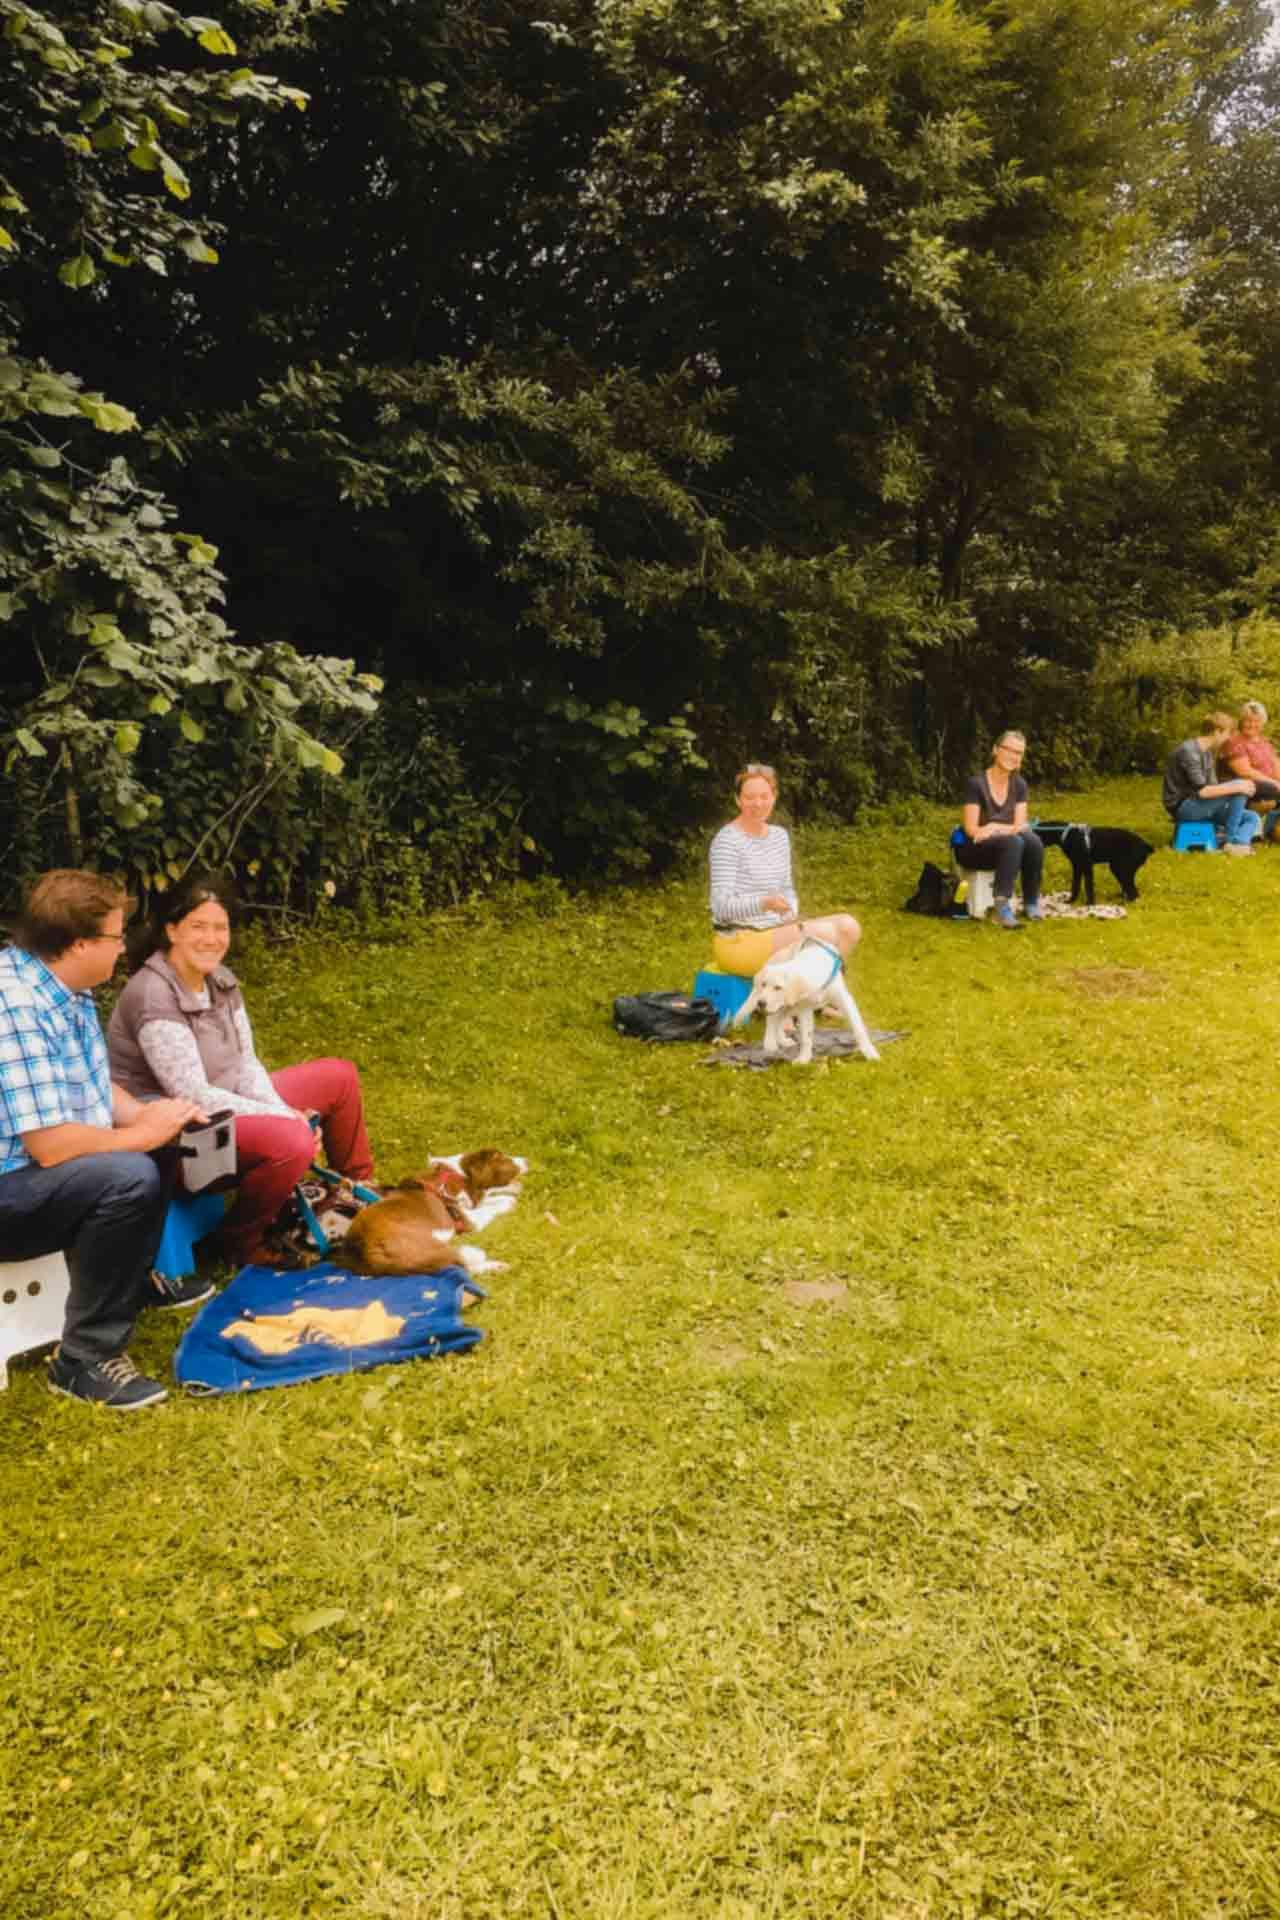 hundpunkt_hundeschule_muenster-ibbenbueren-kurse-gruppentraining-15